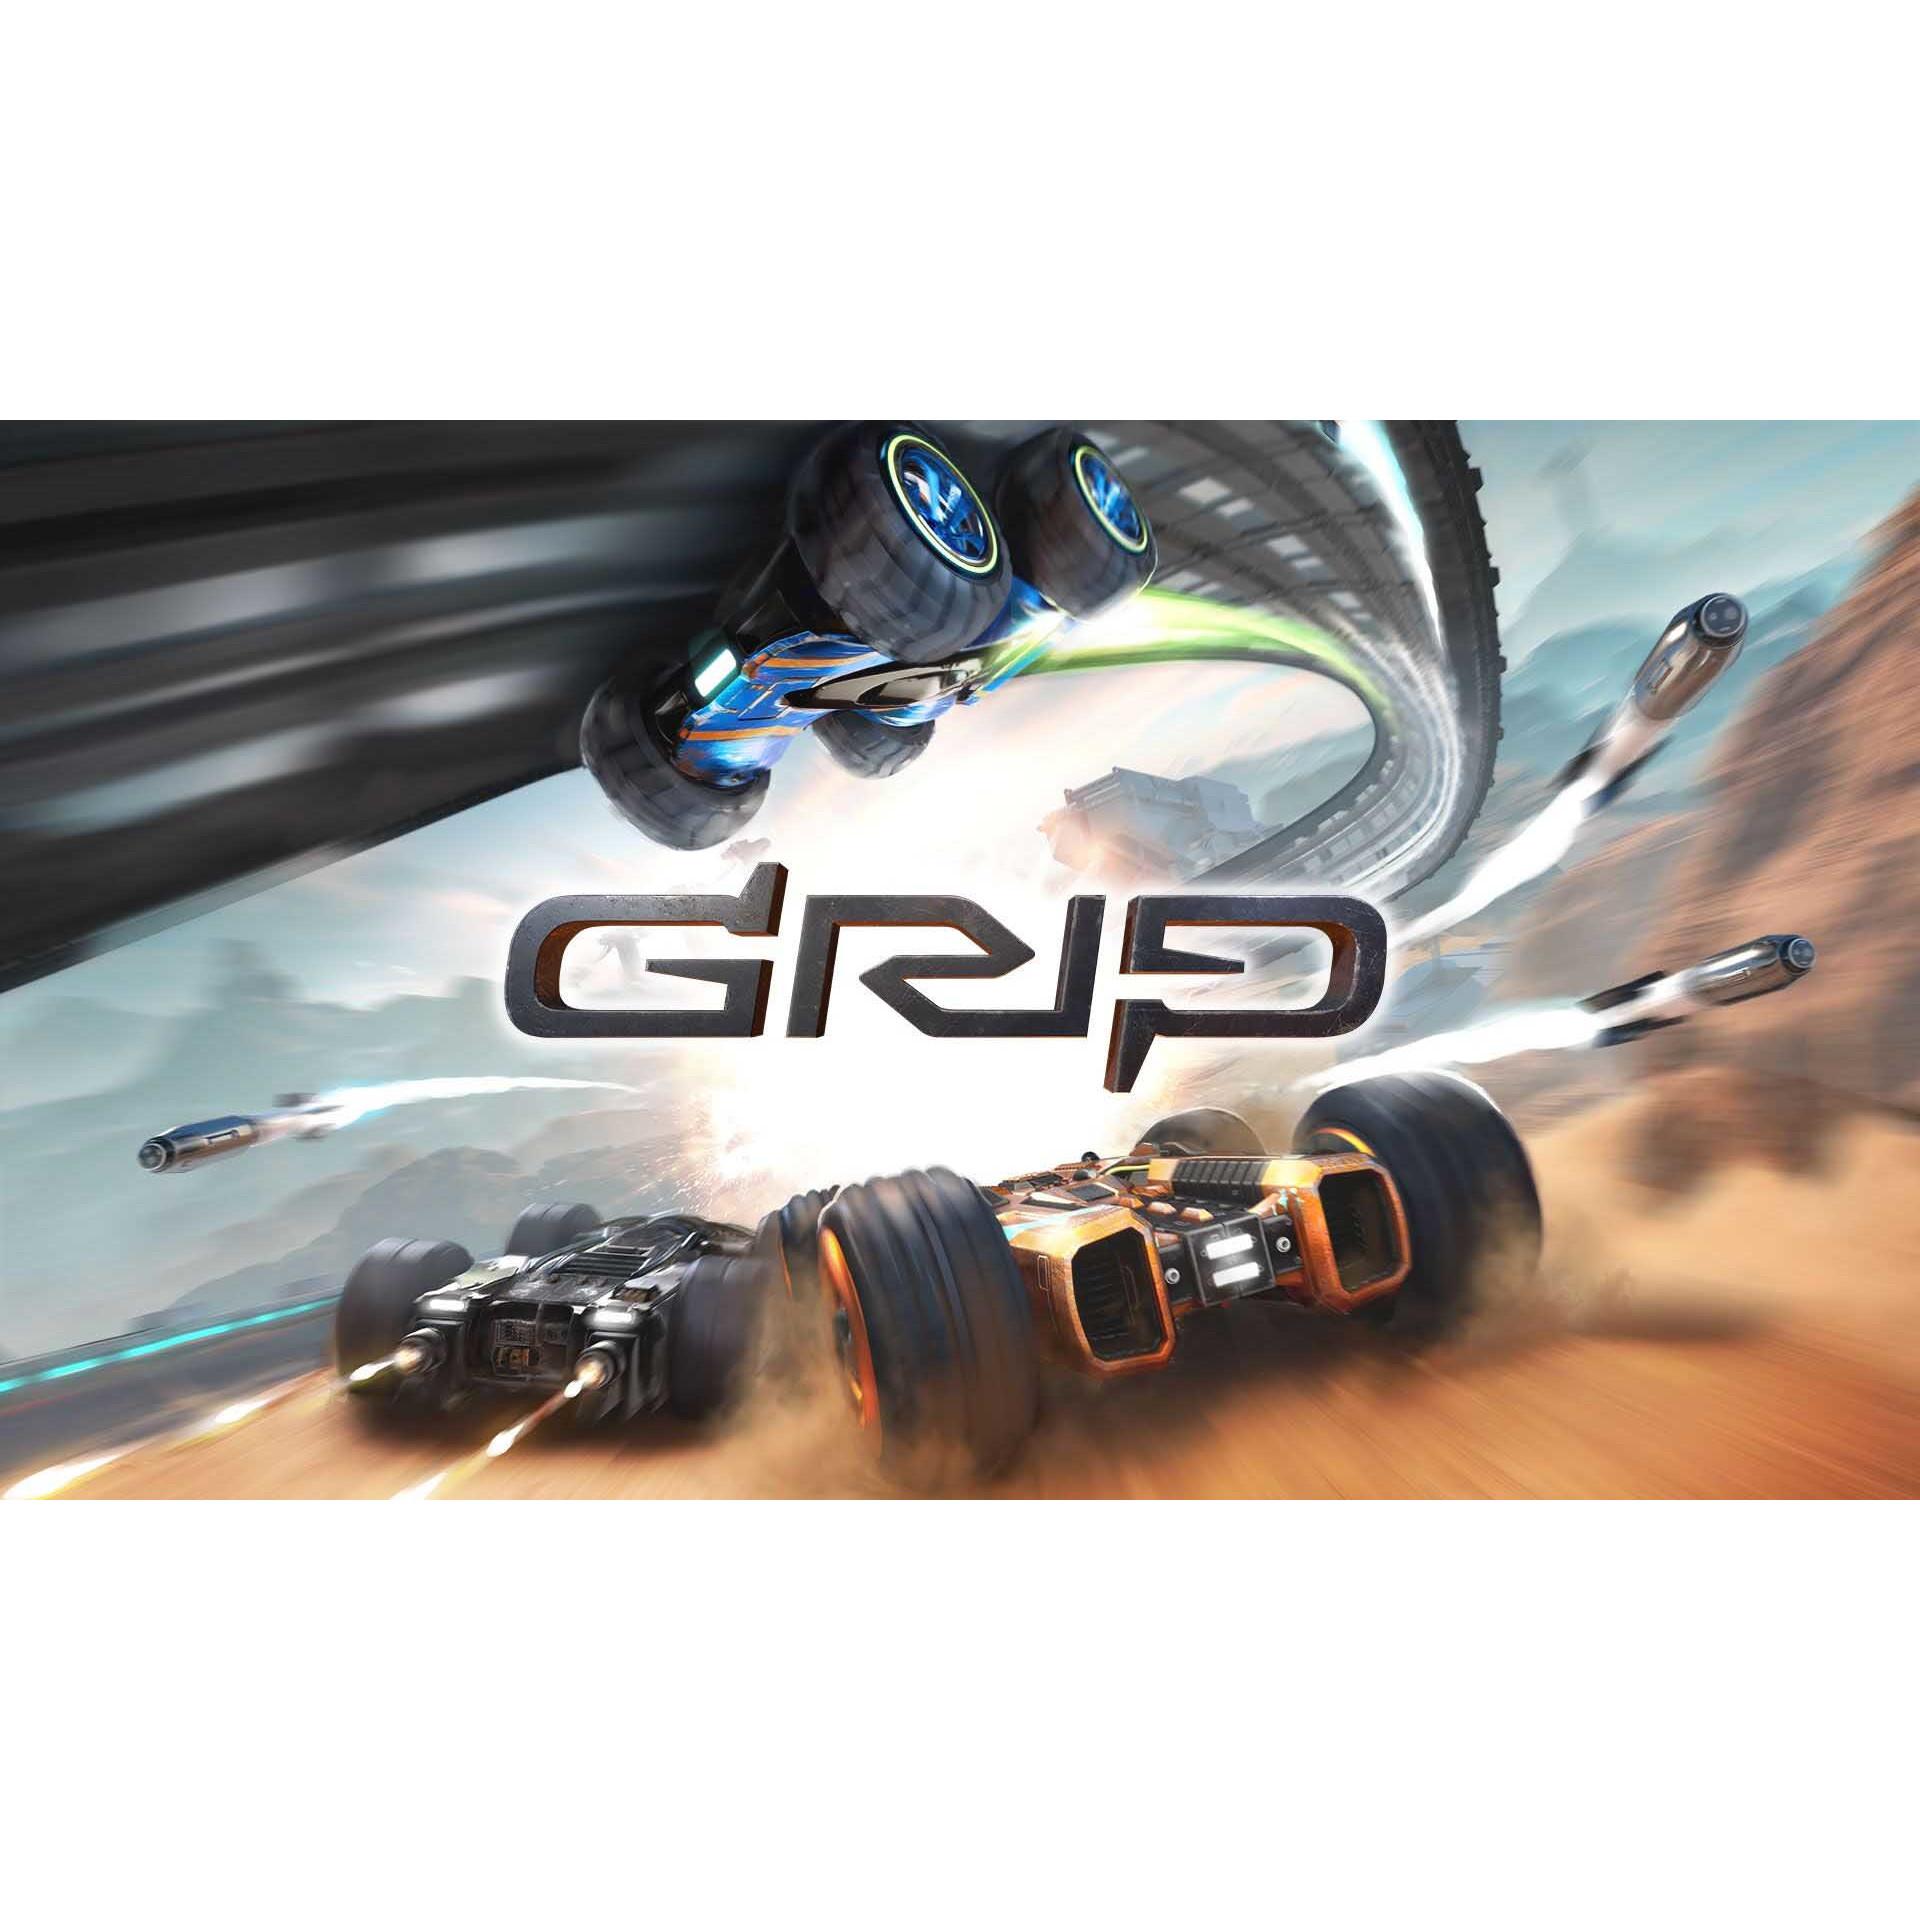 Joc GRIP: Combat Racing - Airblades vs Rollers - Ultimate Edition (EU) Pentru PlayStation 4 2